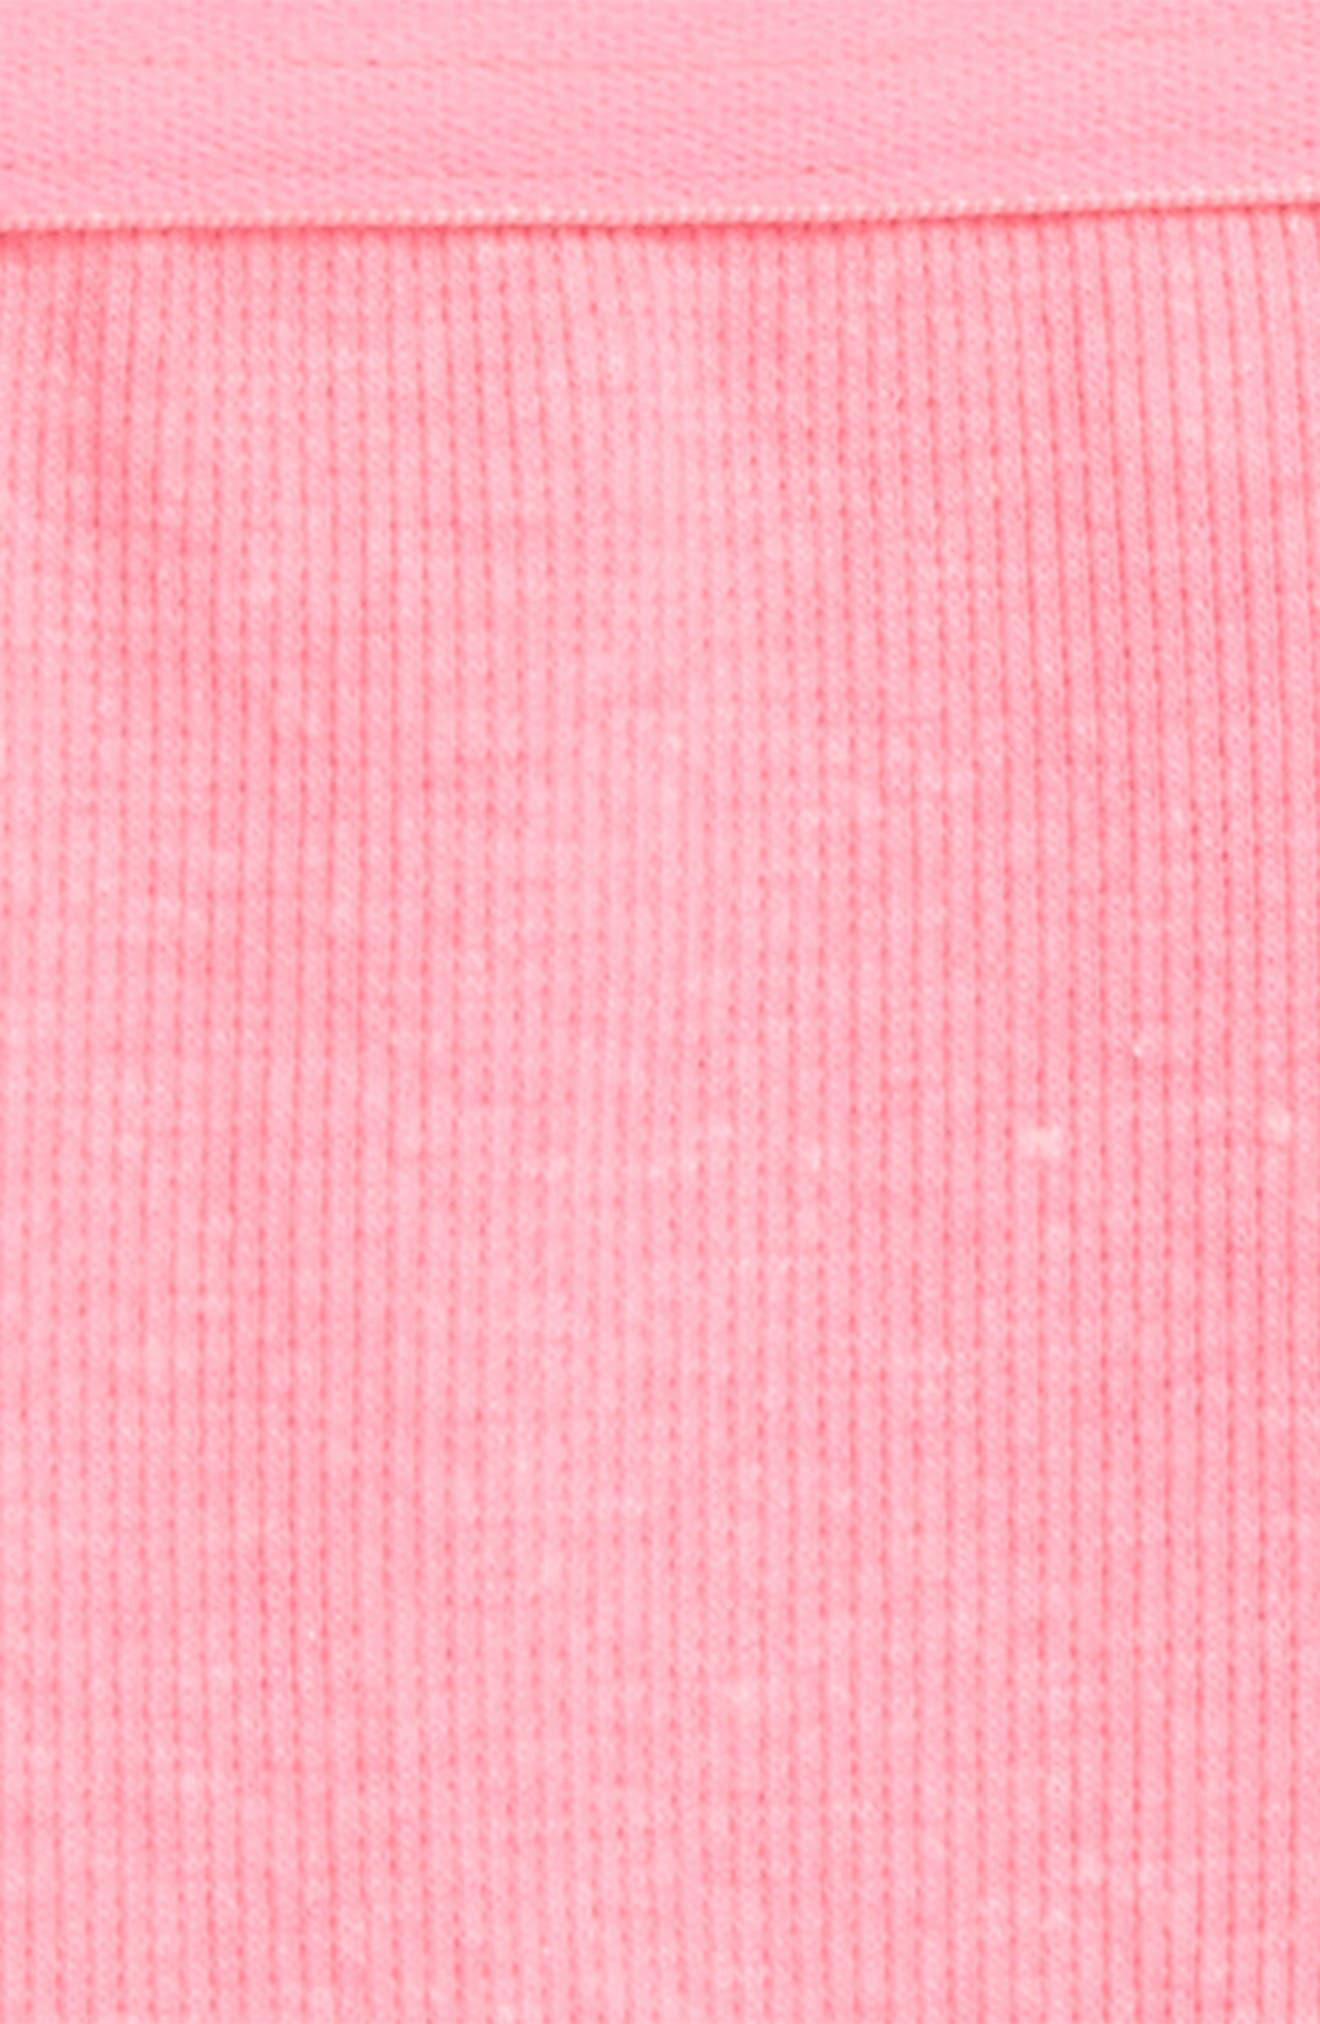 2-Pack Ribbed Leggings,                             Alternate thumbnail 2, color,                             661